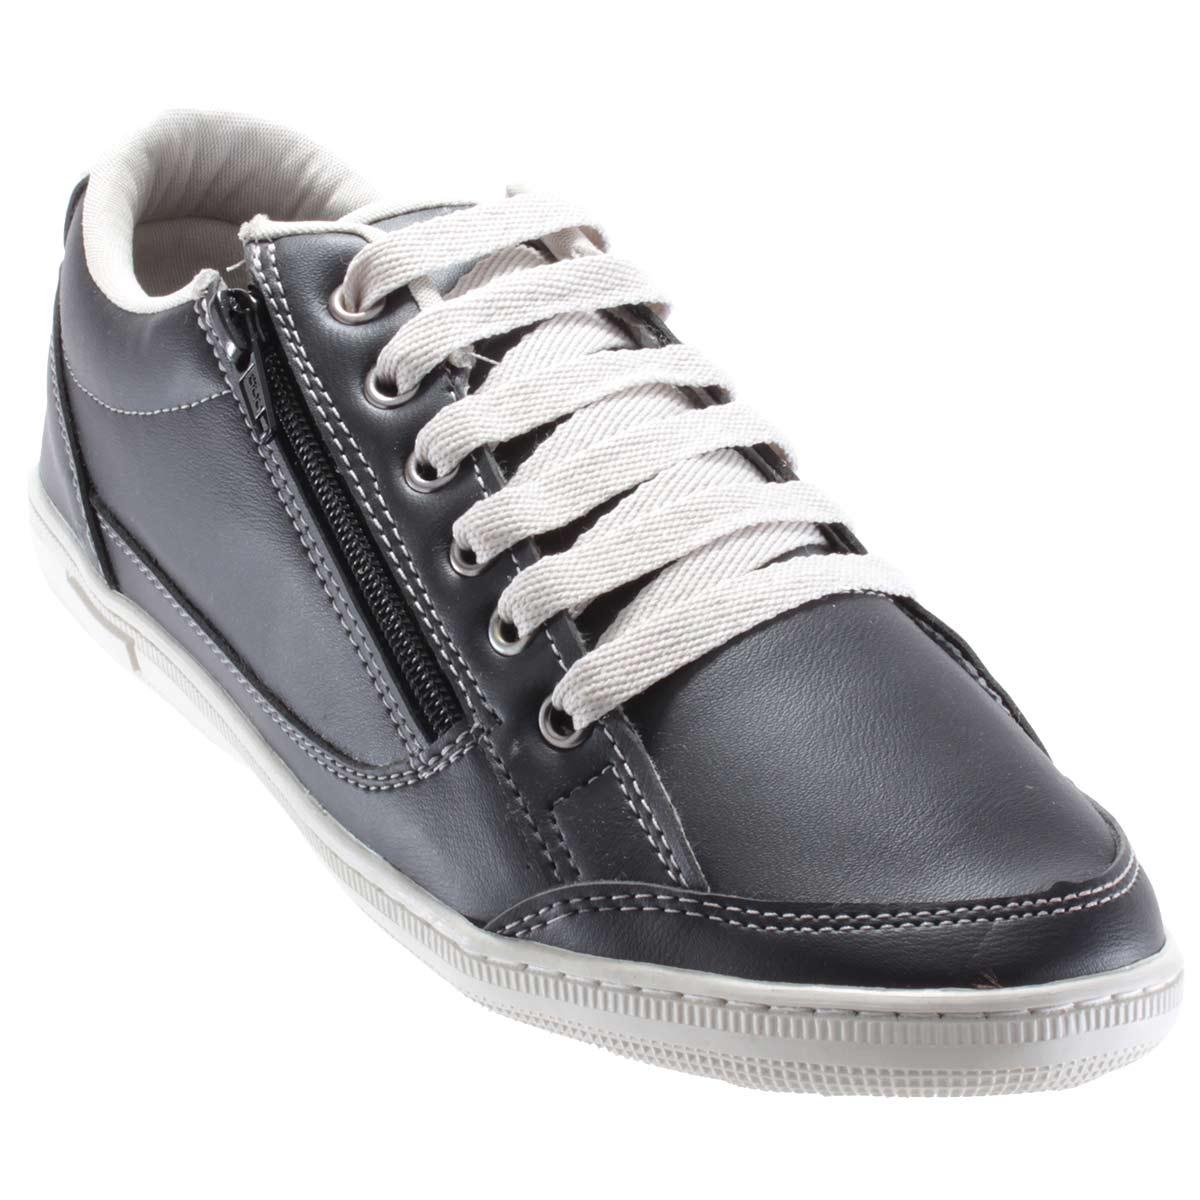 fdb31a1730 Sapatênis Doc Shoes Sintético Casual Ziper Confortável 7124C